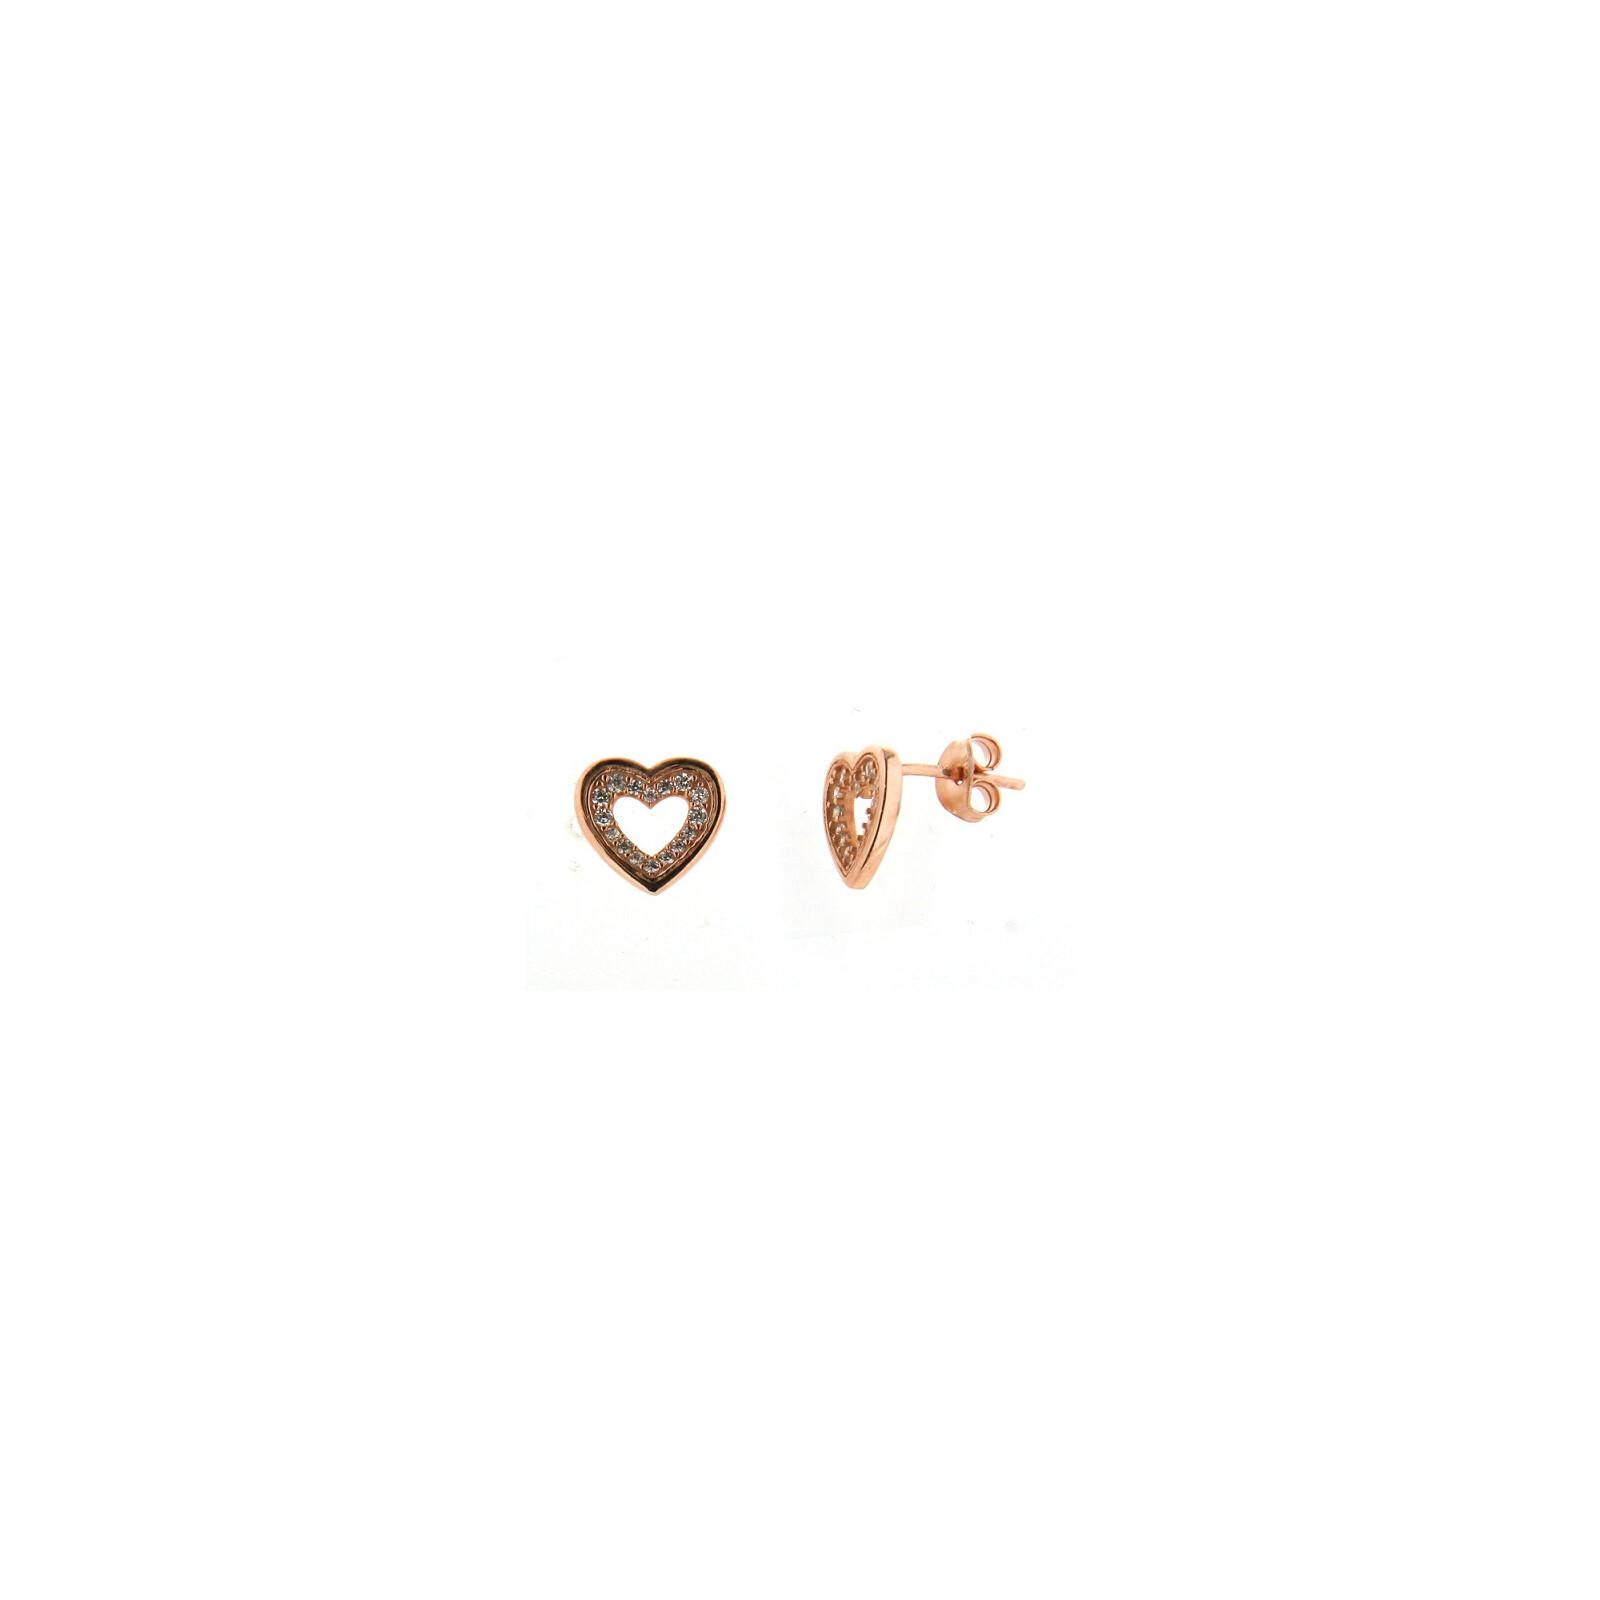 Ohrstecker Zirkonia rosevergoldet Herz